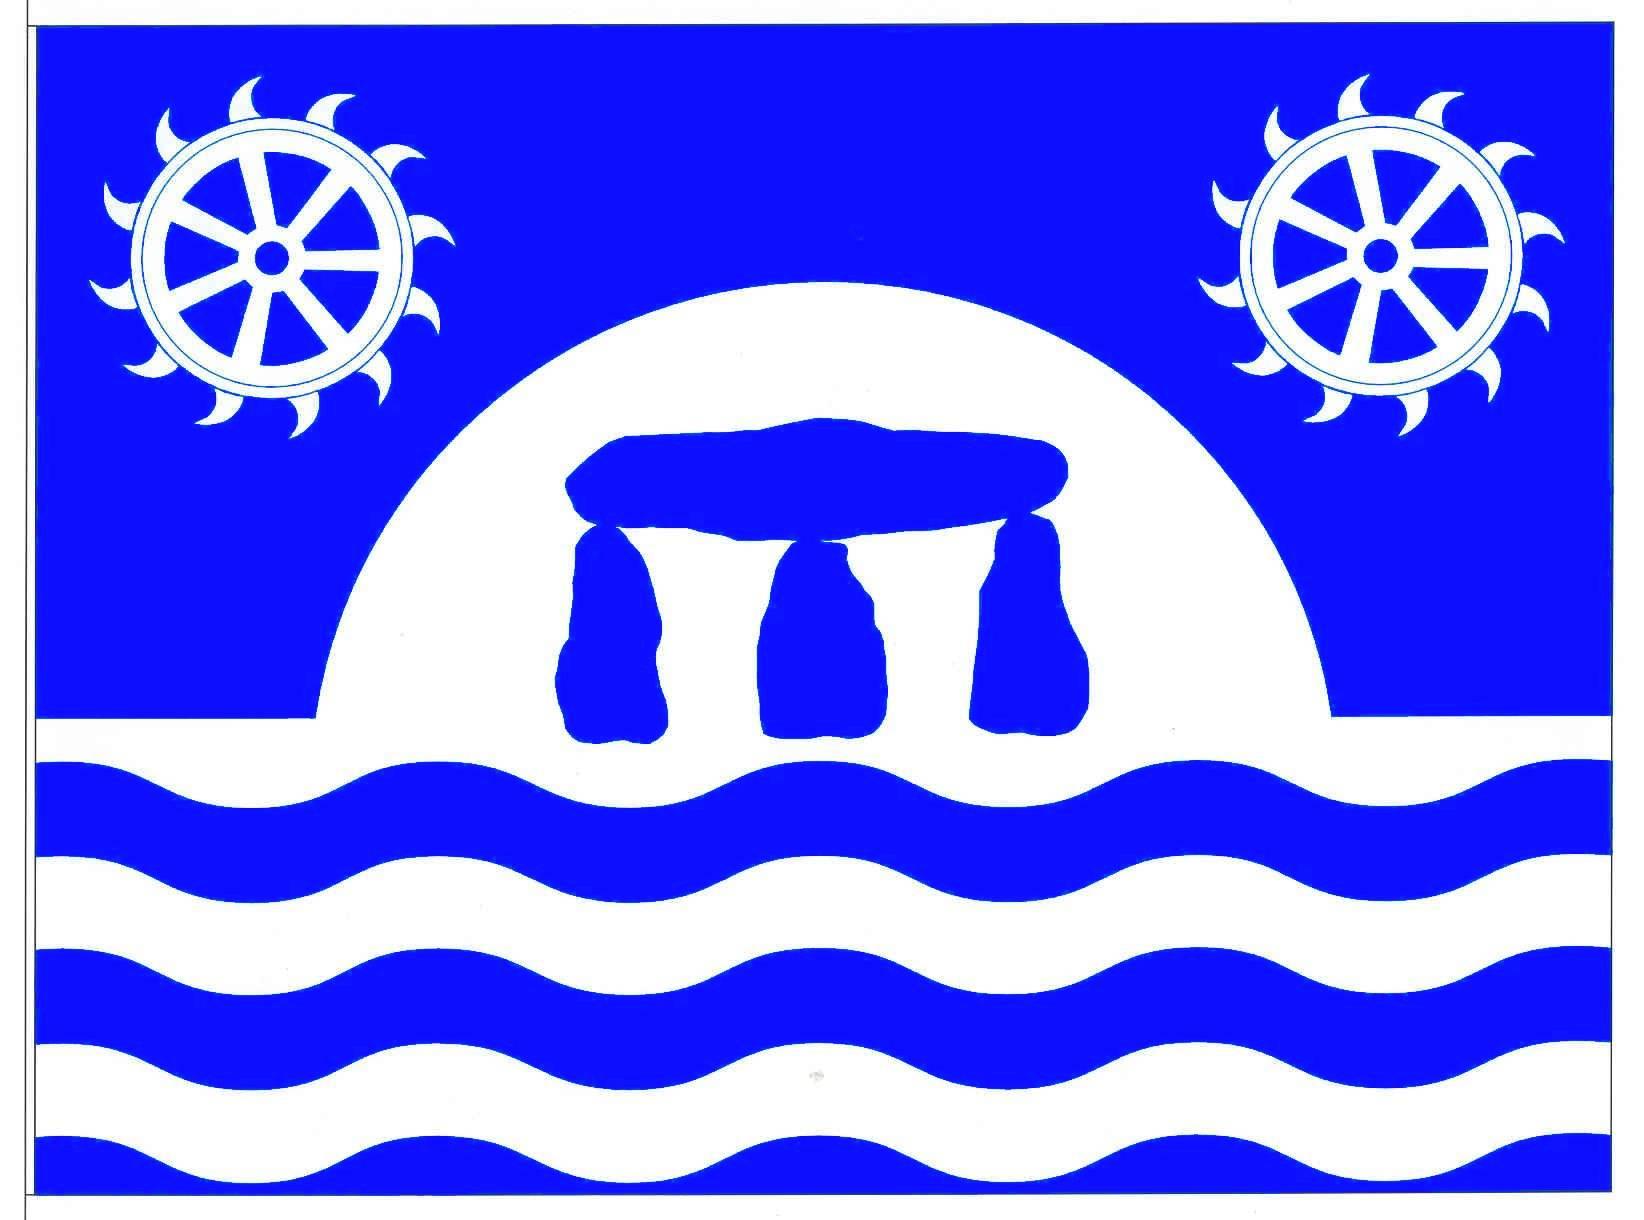 Flagge GemeindeWarder, Kreis Rendsburg-Eckernförde